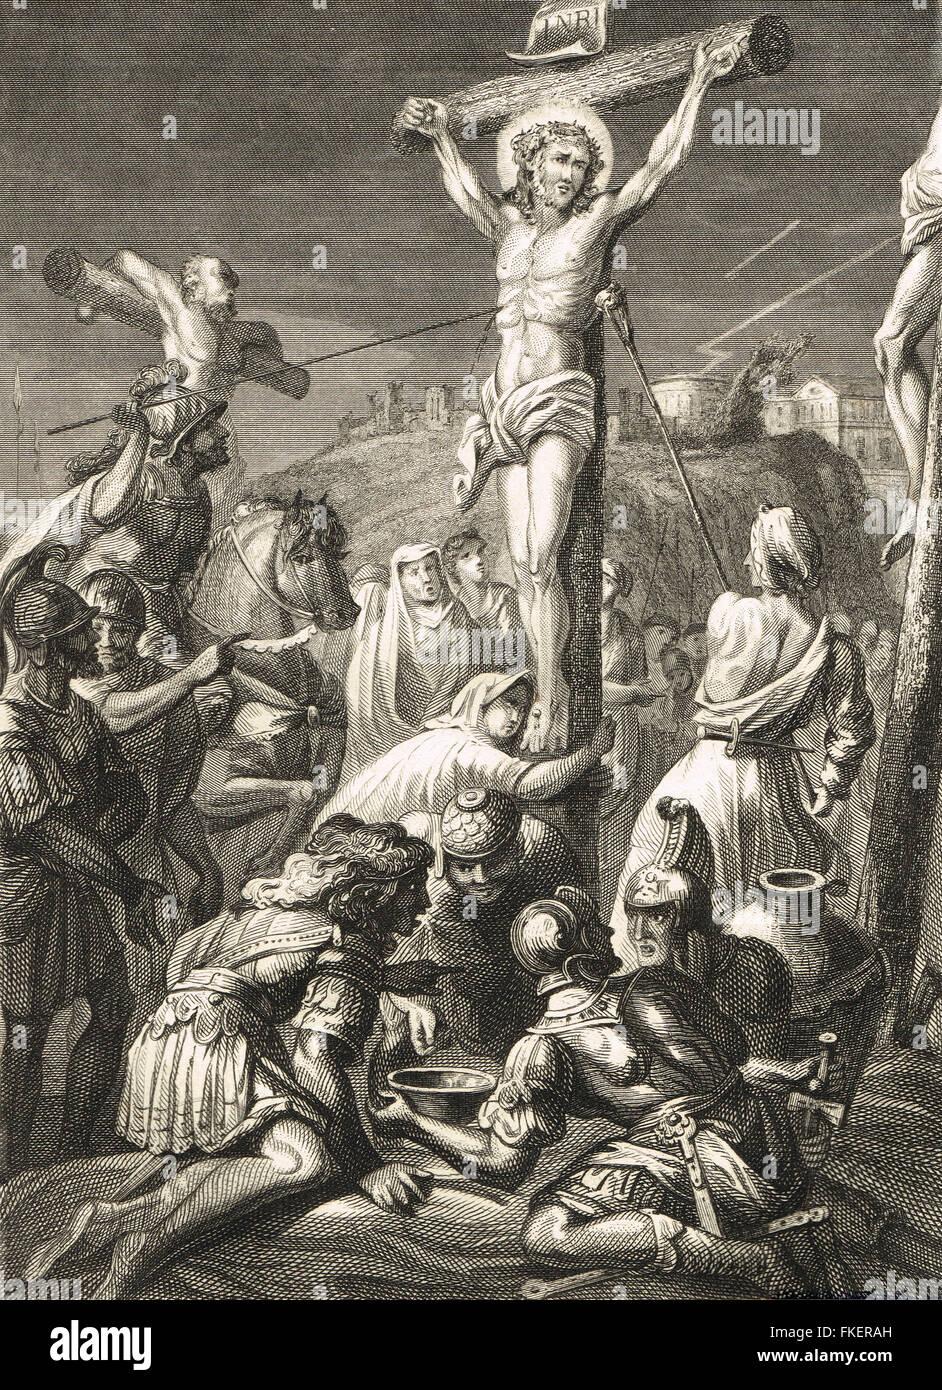 Kreuzigung Christi Gravur von 1839 Stockbild